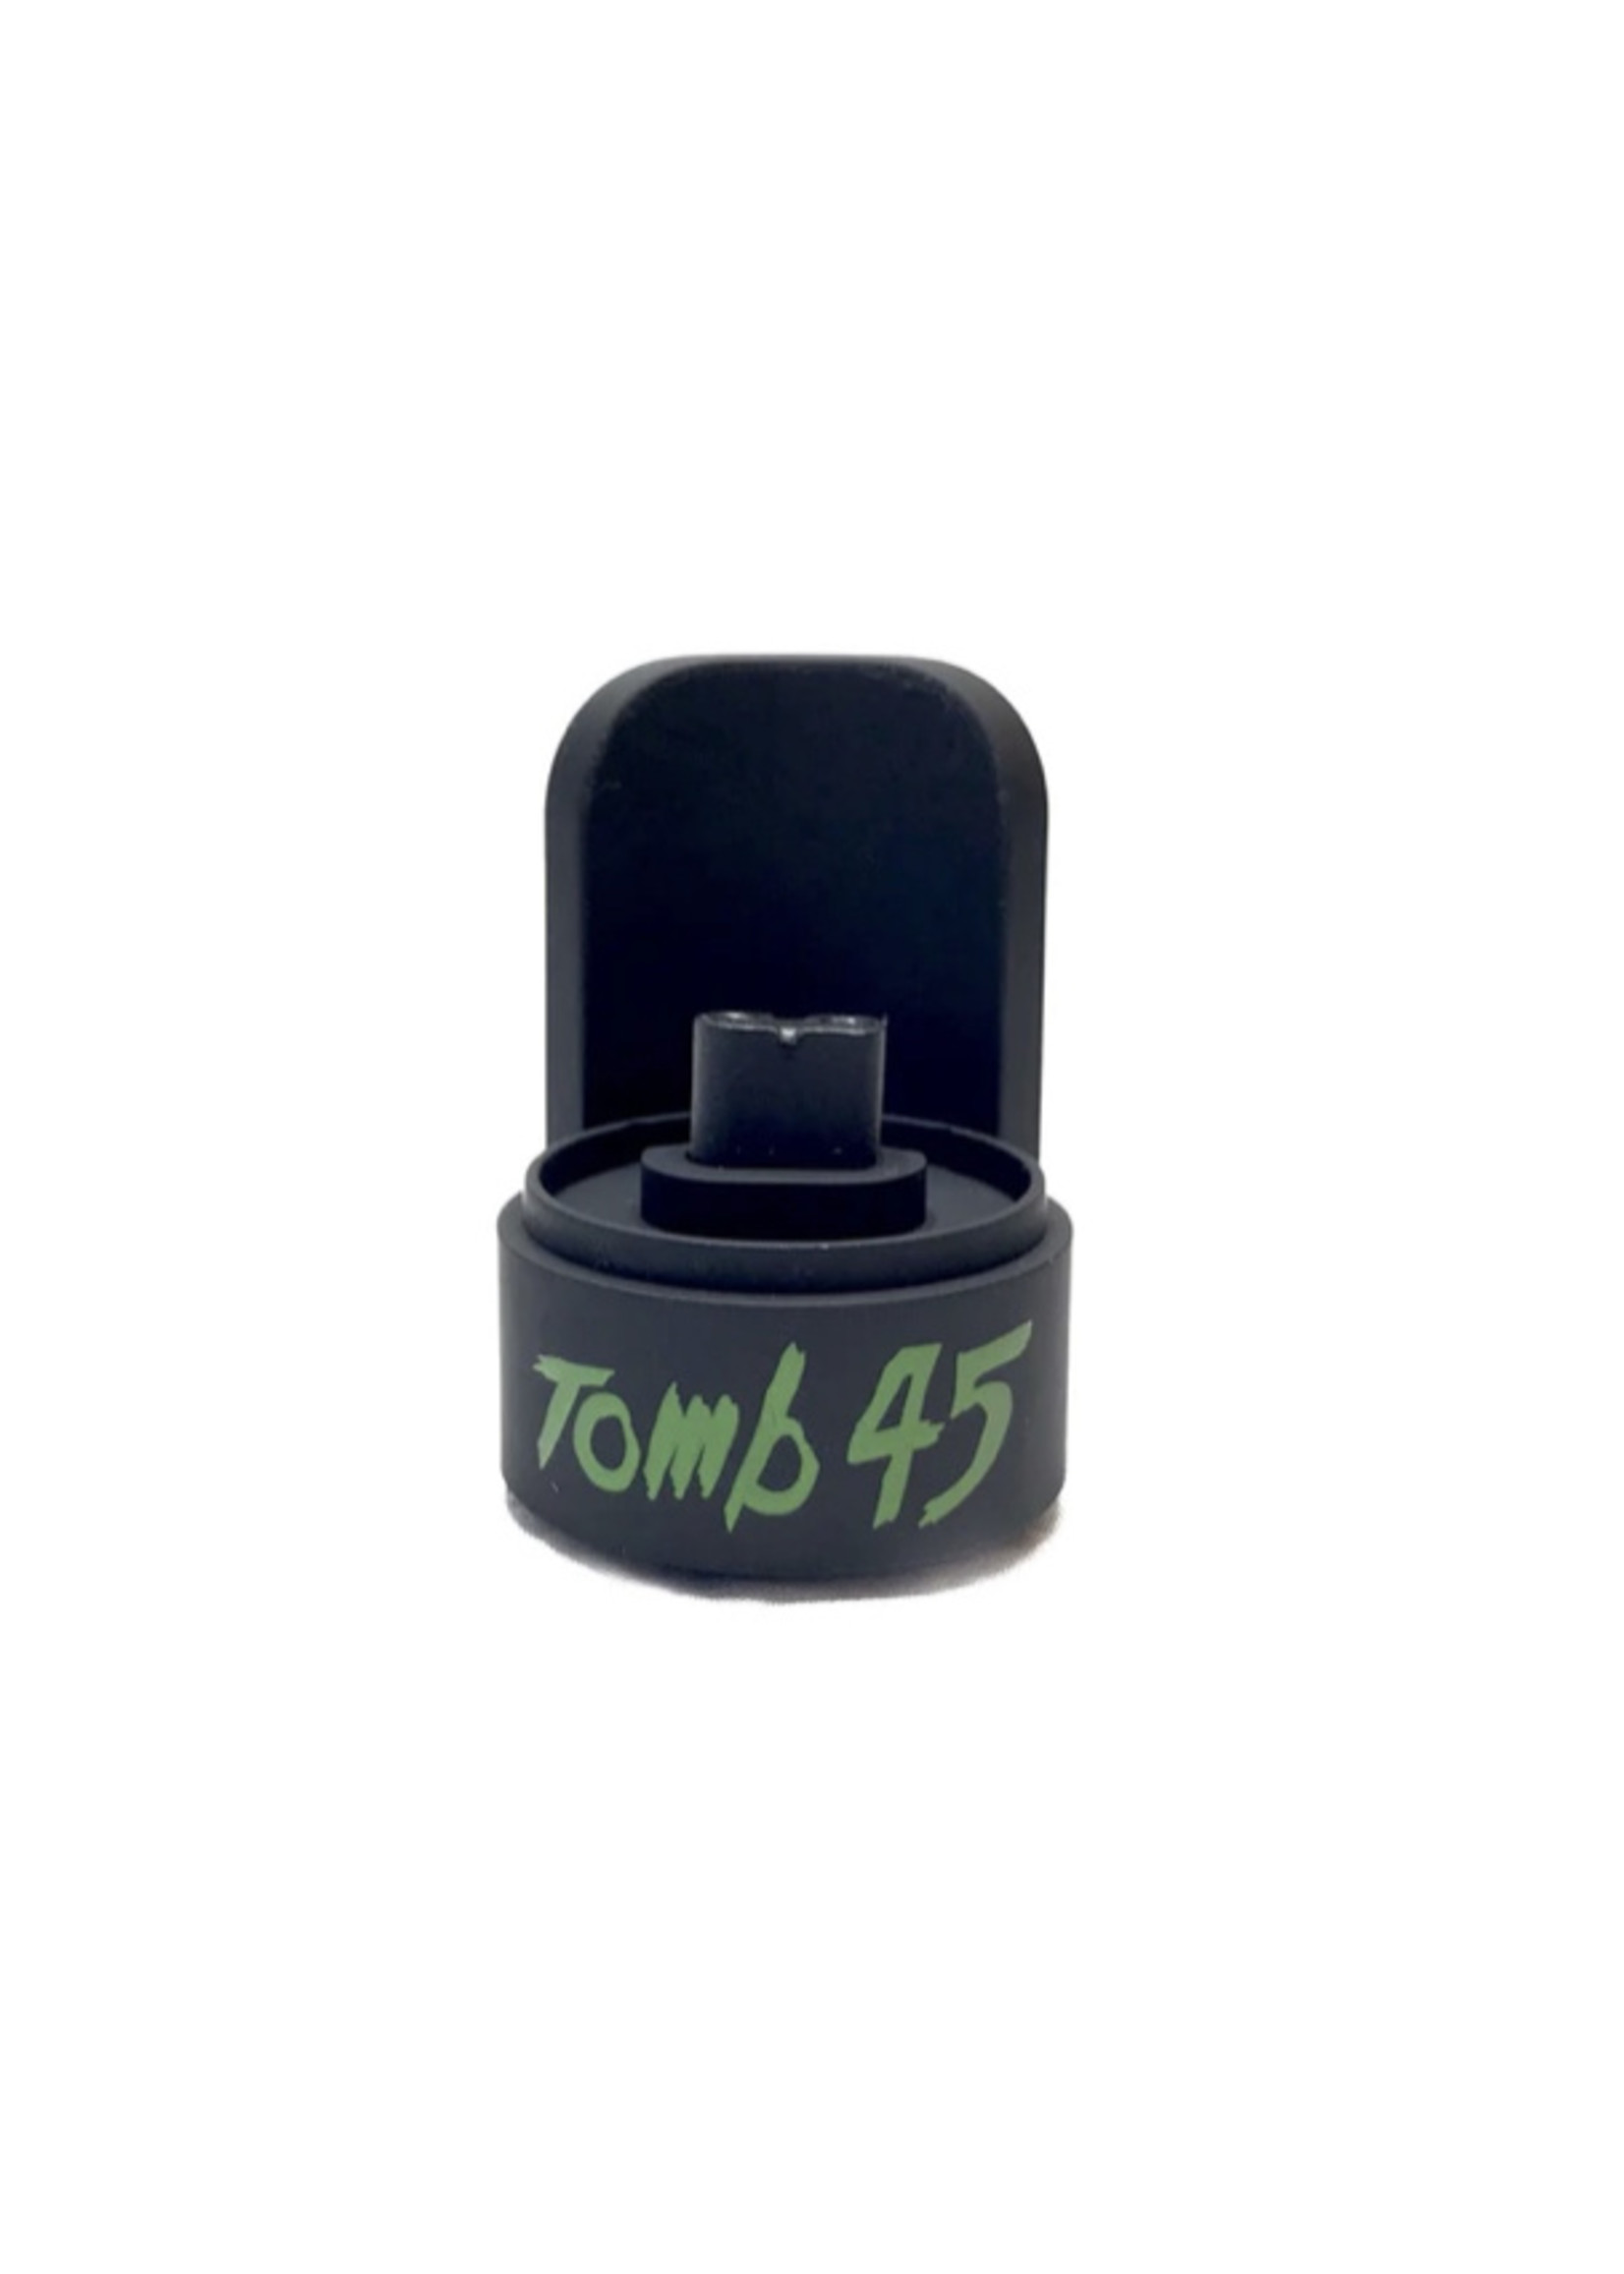 Tomb 45 Tomb45 Power Clip- Babyliss Skeleton FX Trimmer